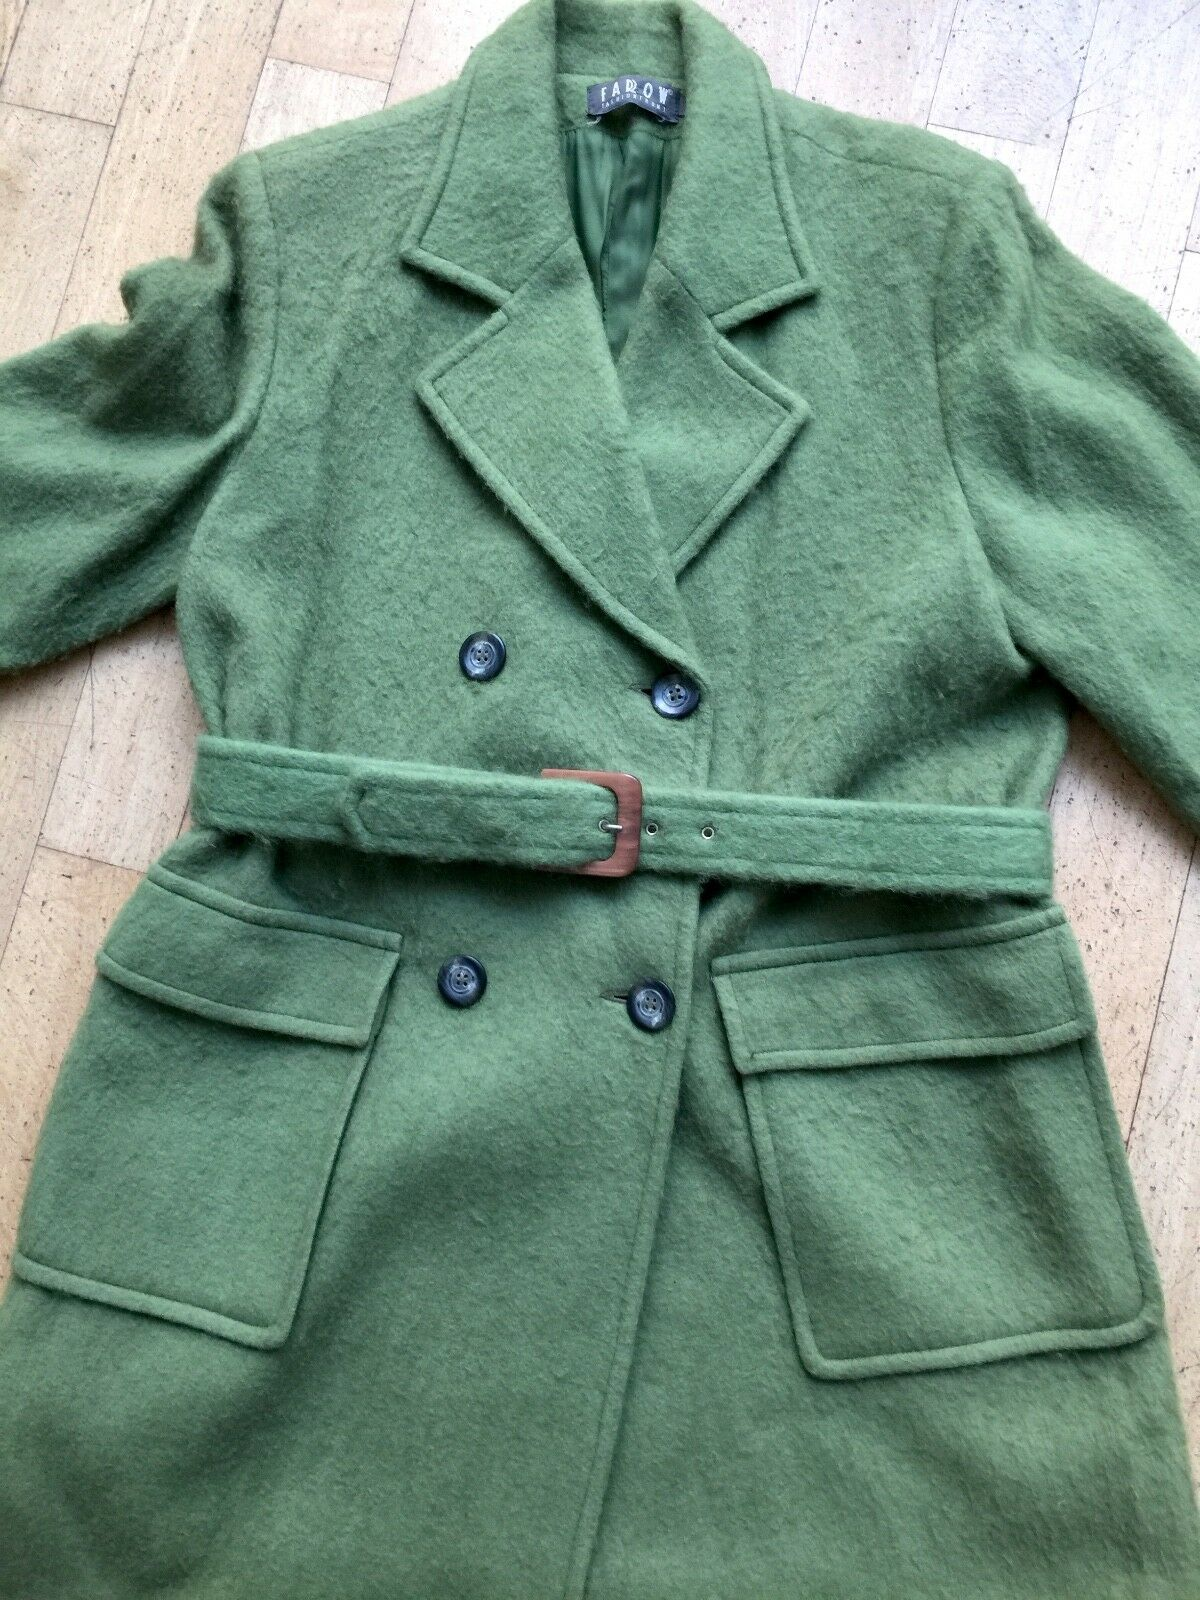 Mantel apfelgrün mit Gürtel   Farrow Fashionfront   Gr. 36